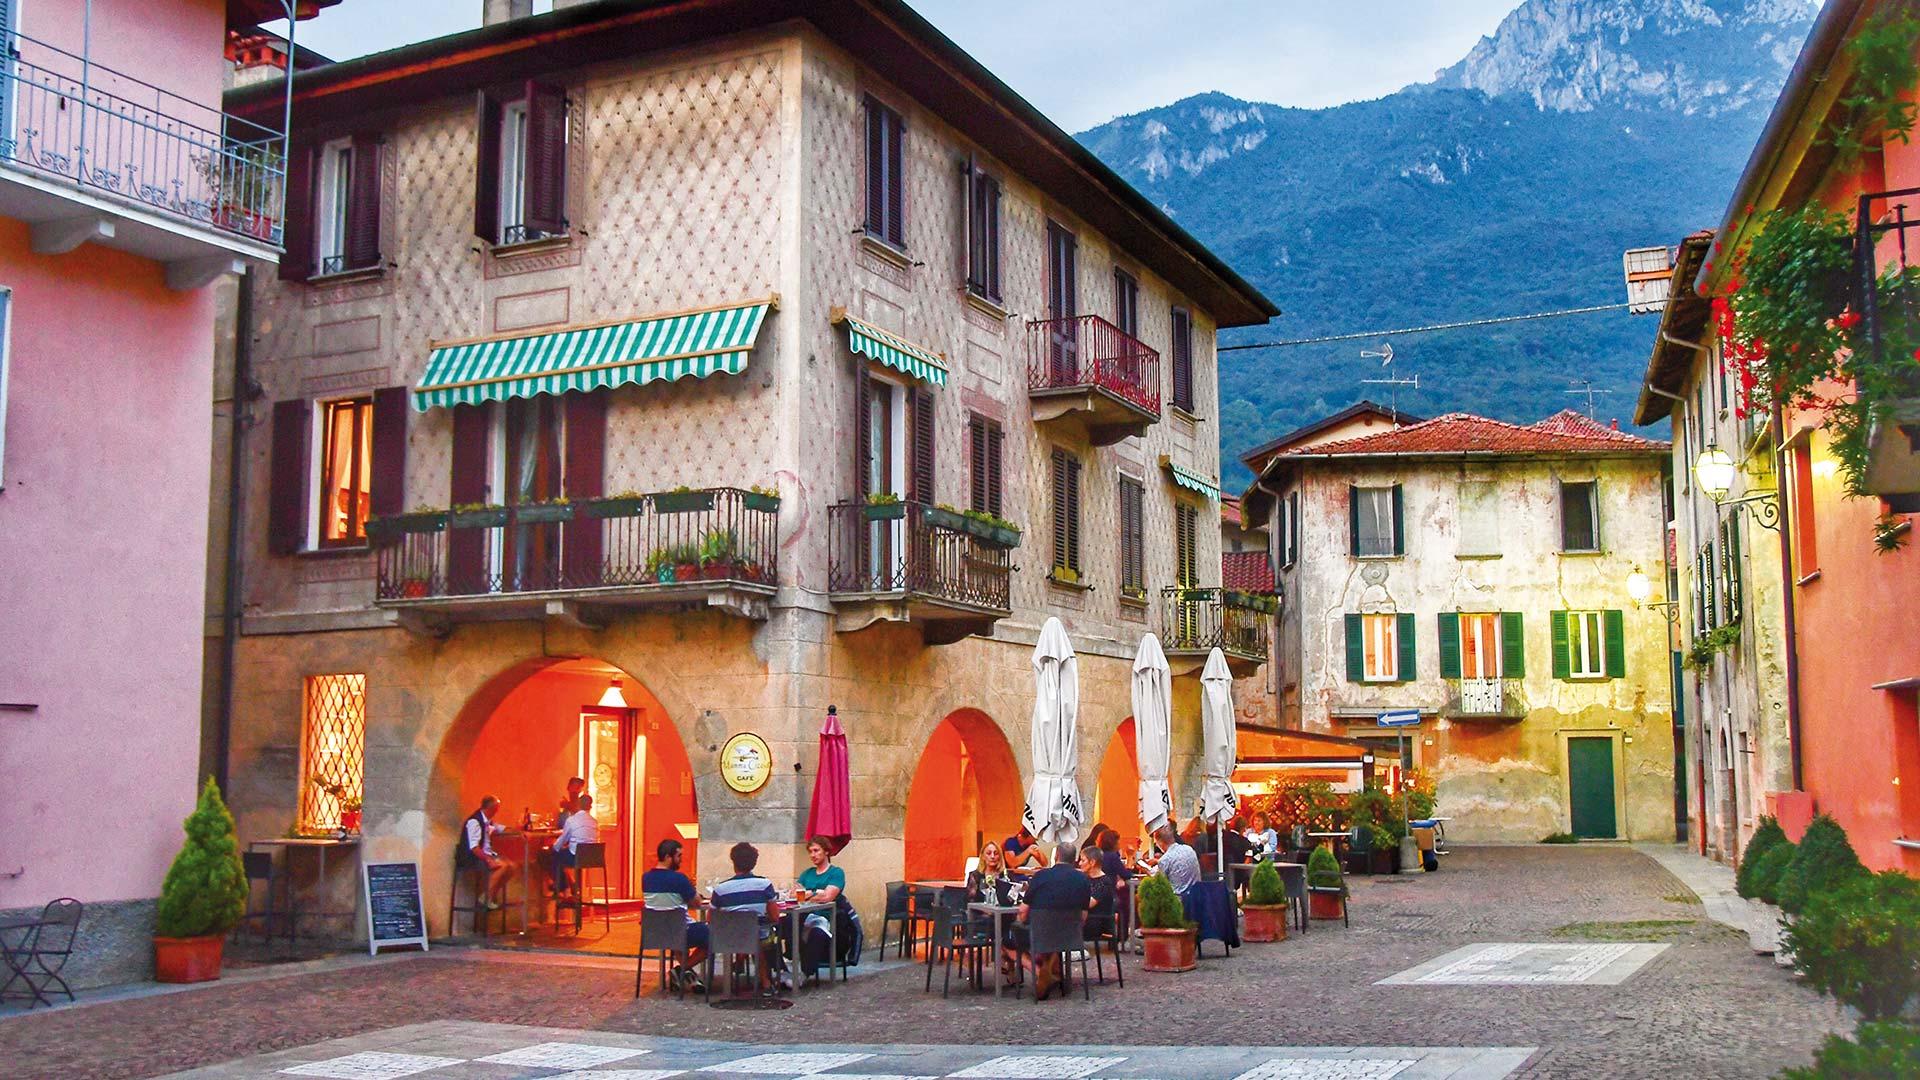 Saluti, Alpi Orobie! Tour 1